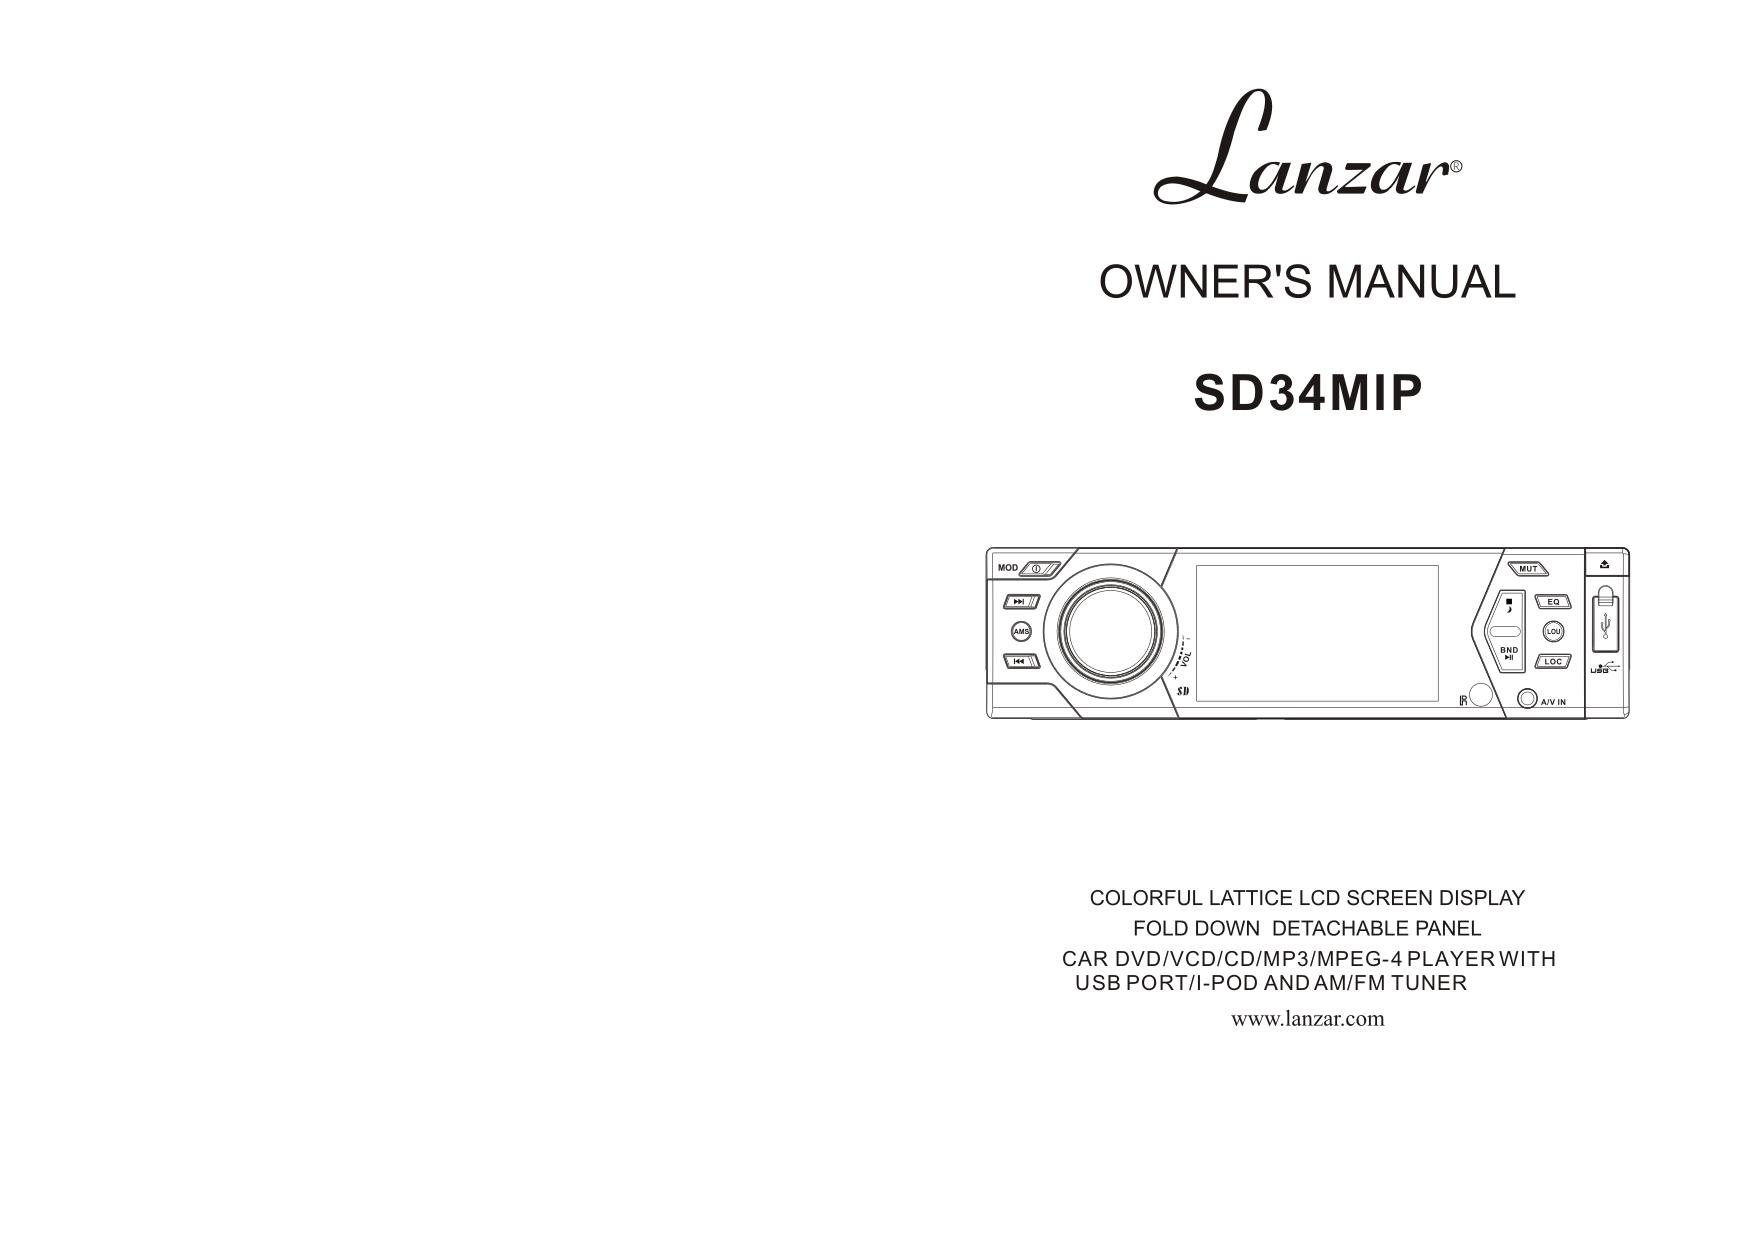 pdf for Lanzar Car Video SD34MIP manual